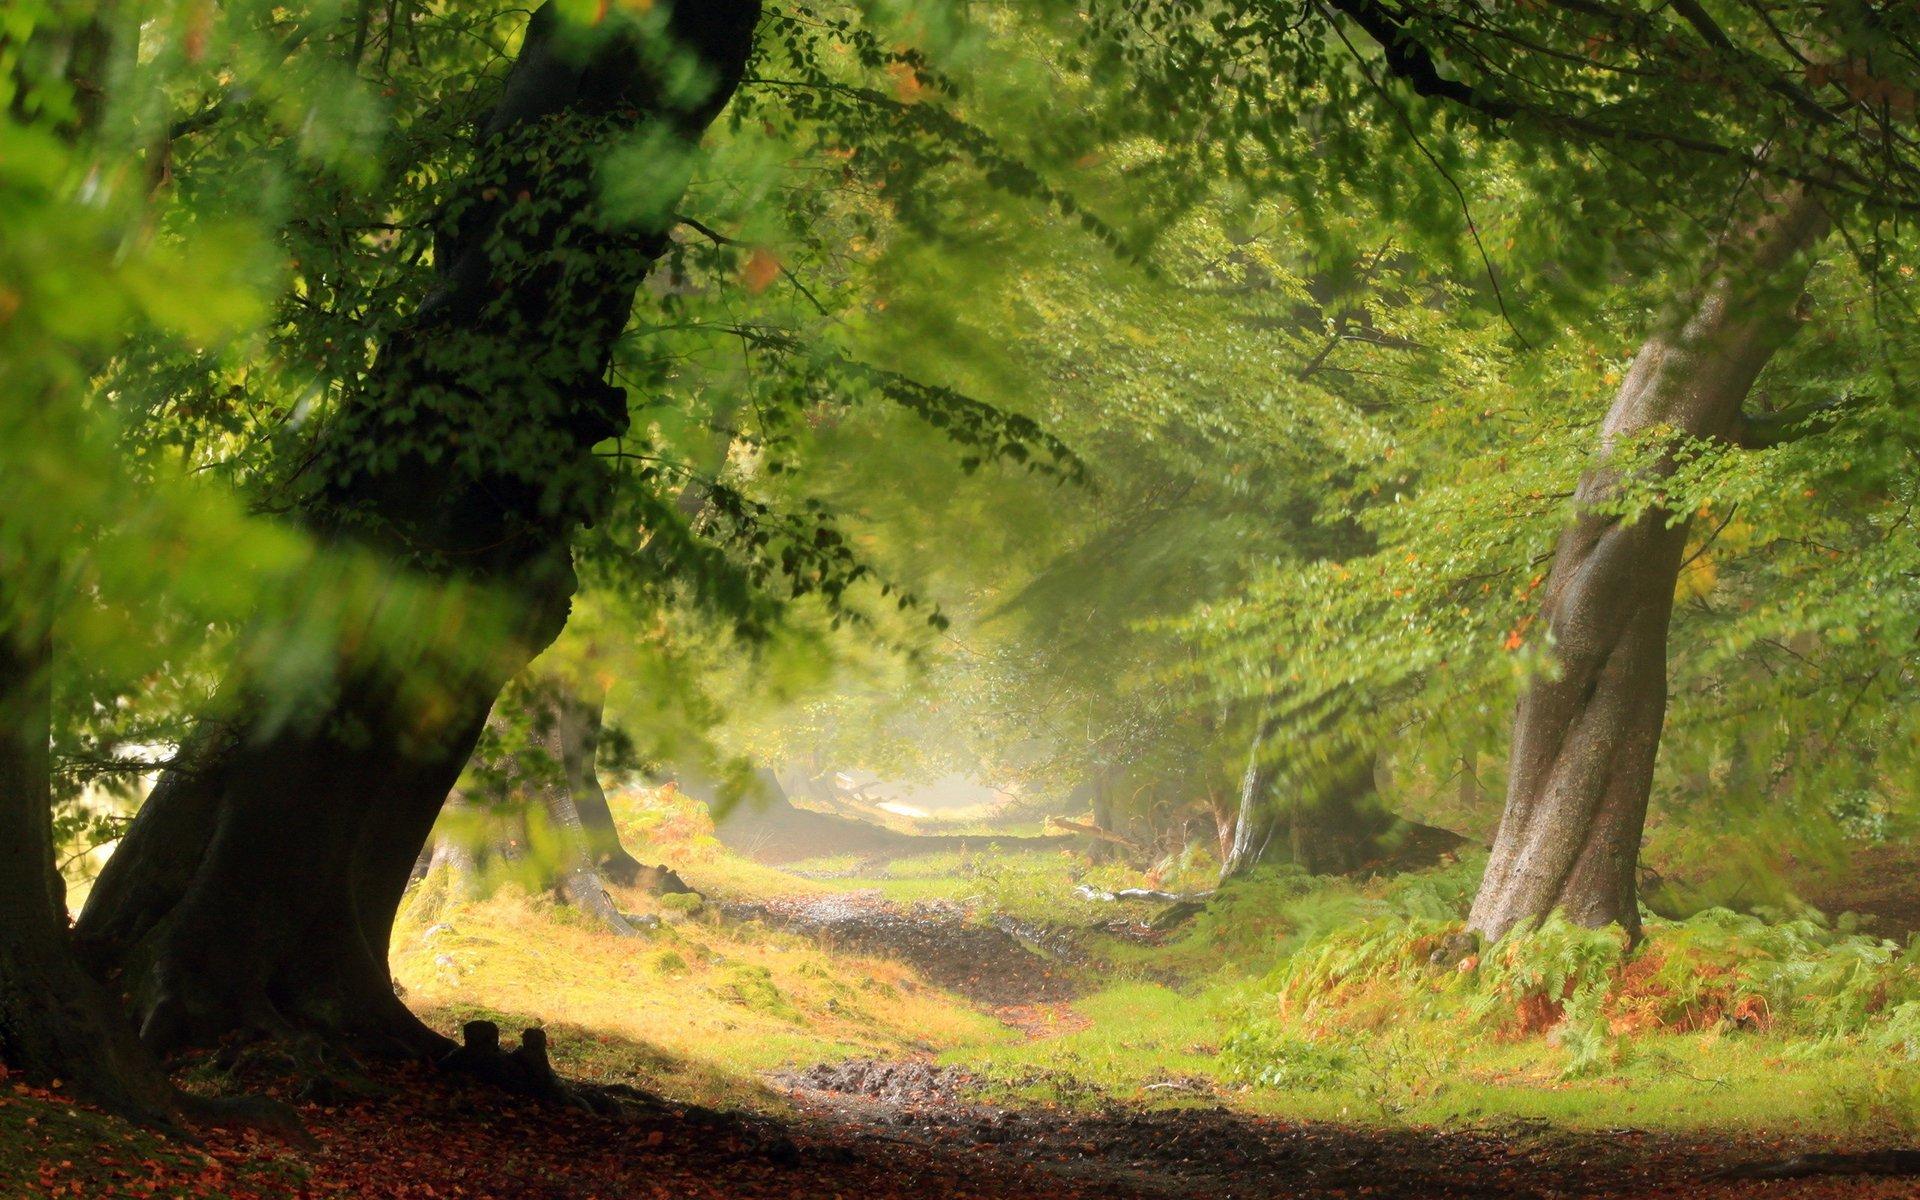 Earth - Forest  Landscape Scenic Wallpaper